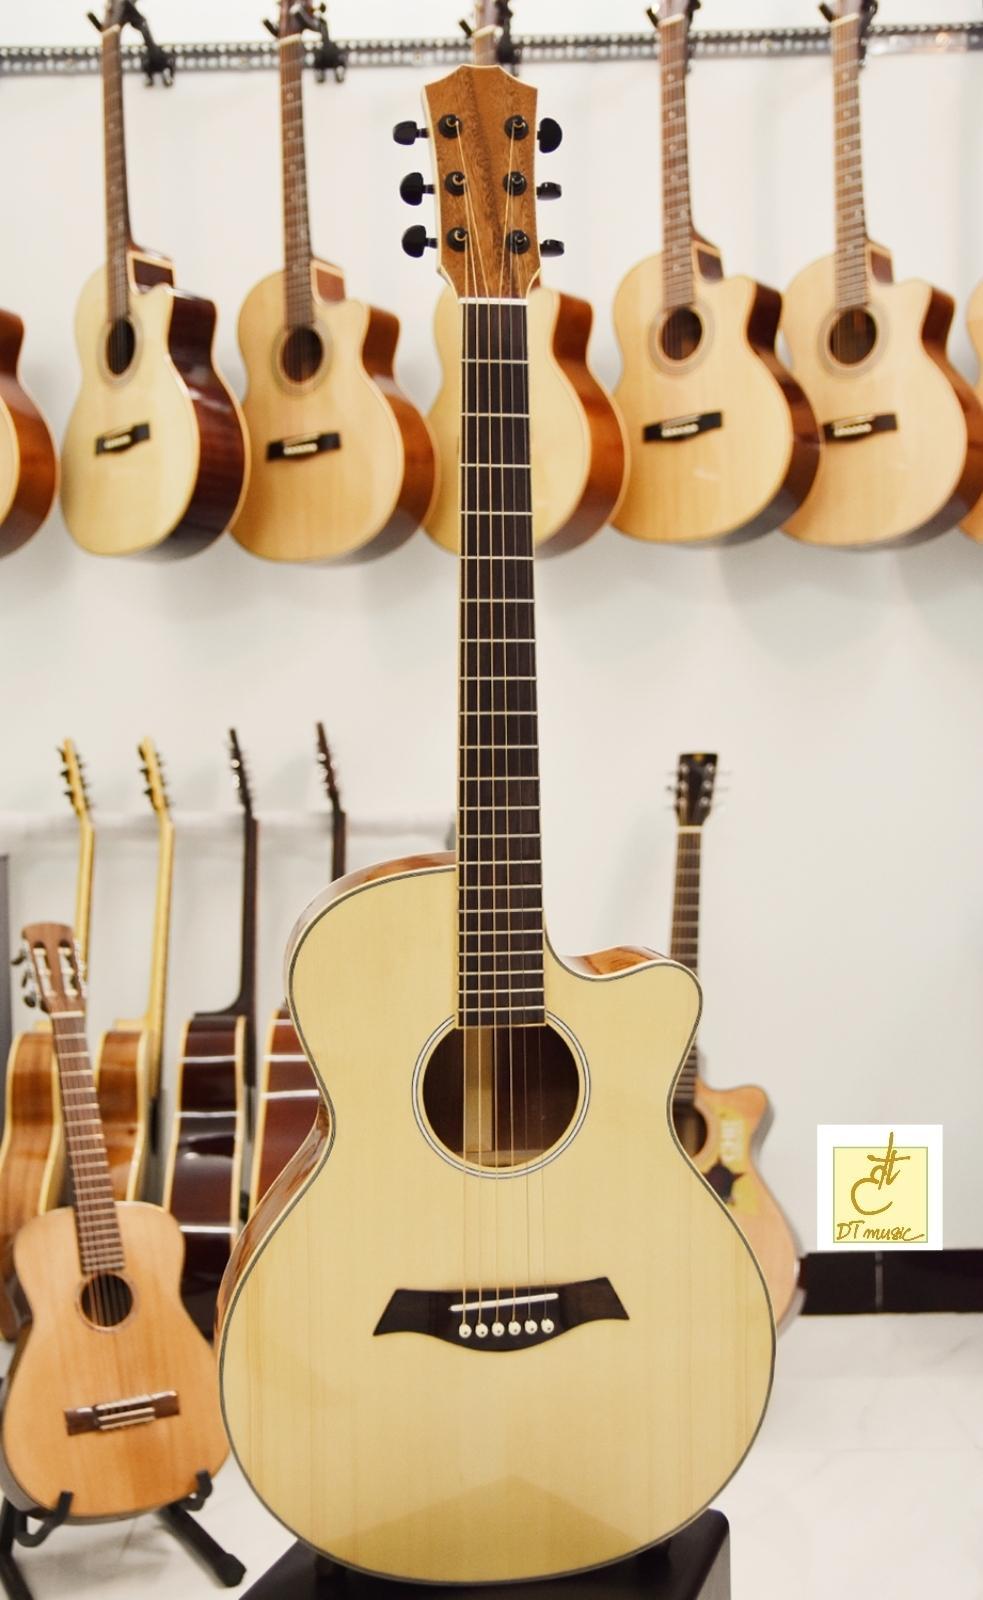 Guitar Acoustic  Gỗ Mahogany  DT-A25c3  Tặng kèm bao da và phụ kiện